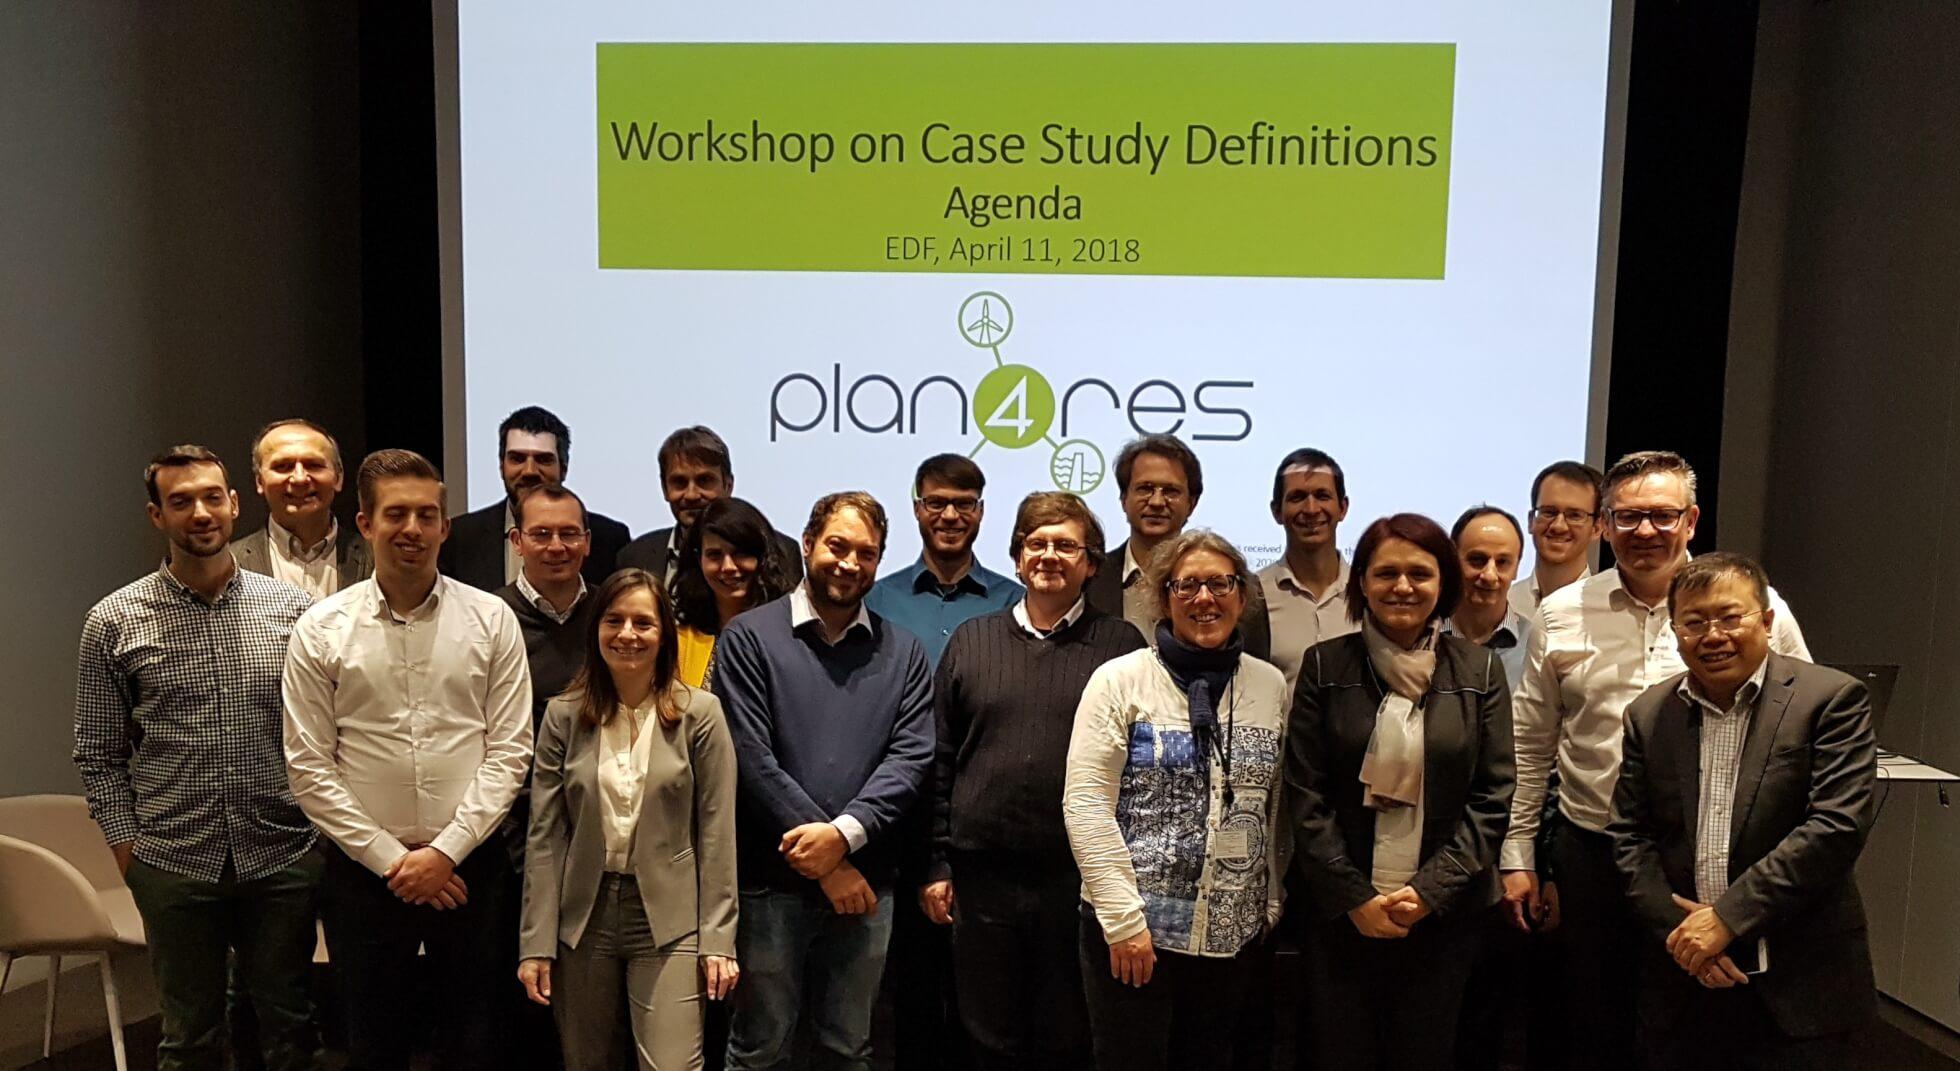 Plan4res Stakeholders Workshop – April 11, 2018